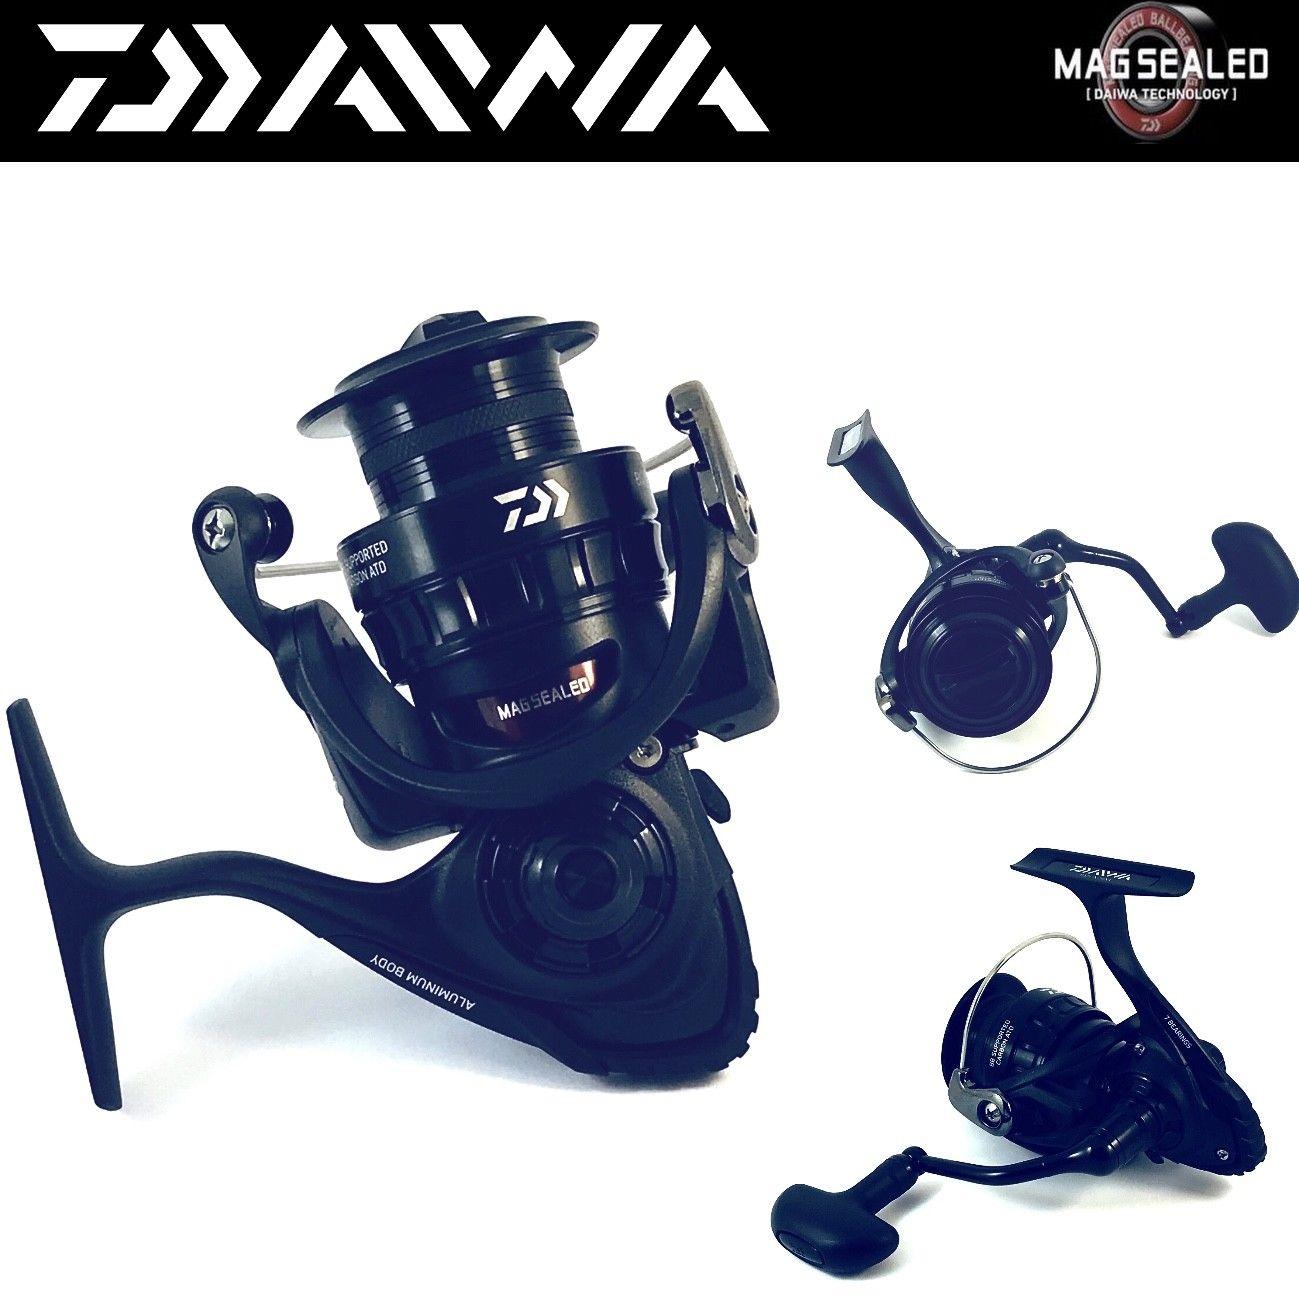 DAIWA DAIWA DAIWA MAGSEALED SALTWATER SPINNING REEL BG a54071